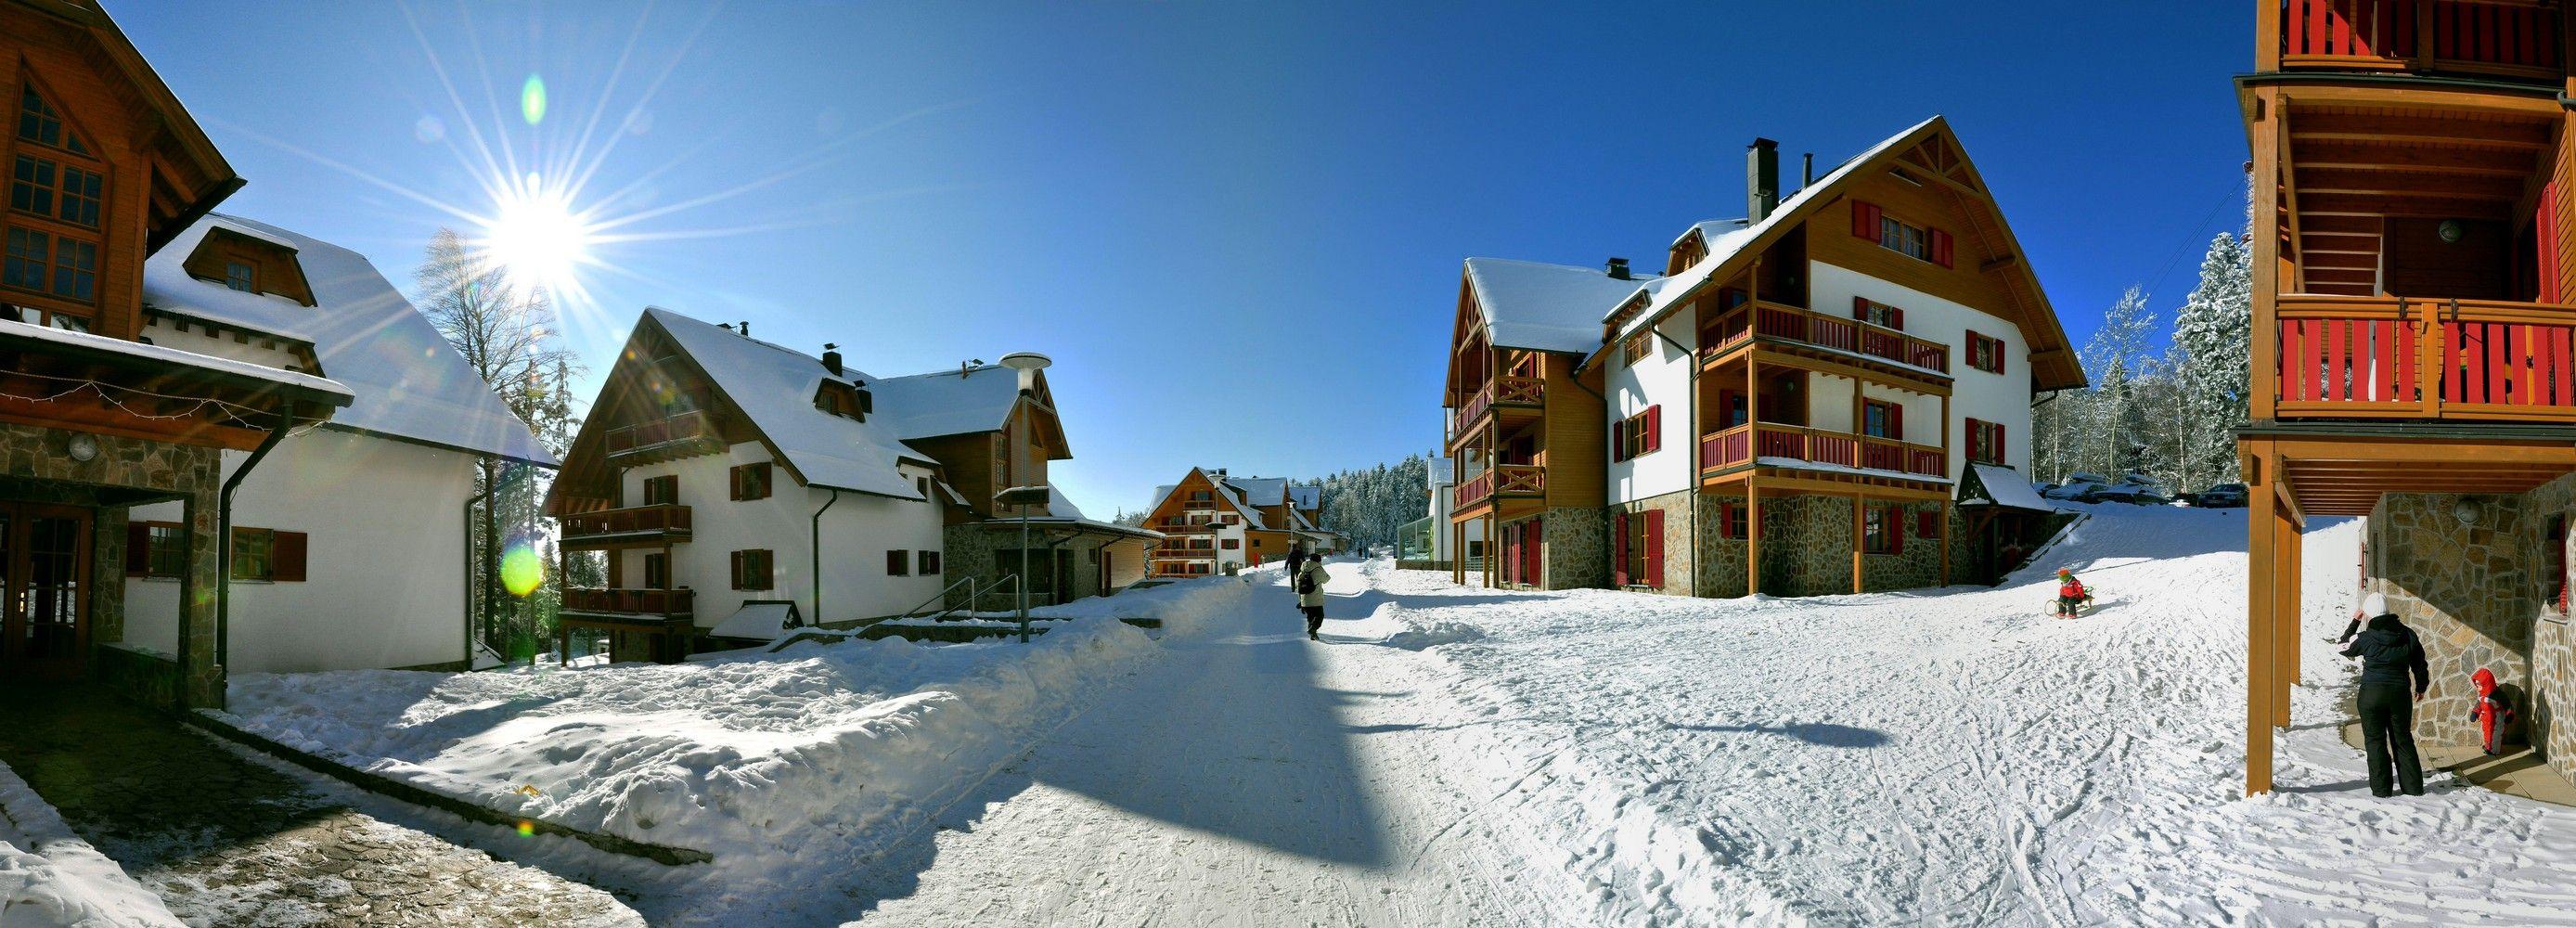 Pin di Relaxino wellness sport holiday su Winter in